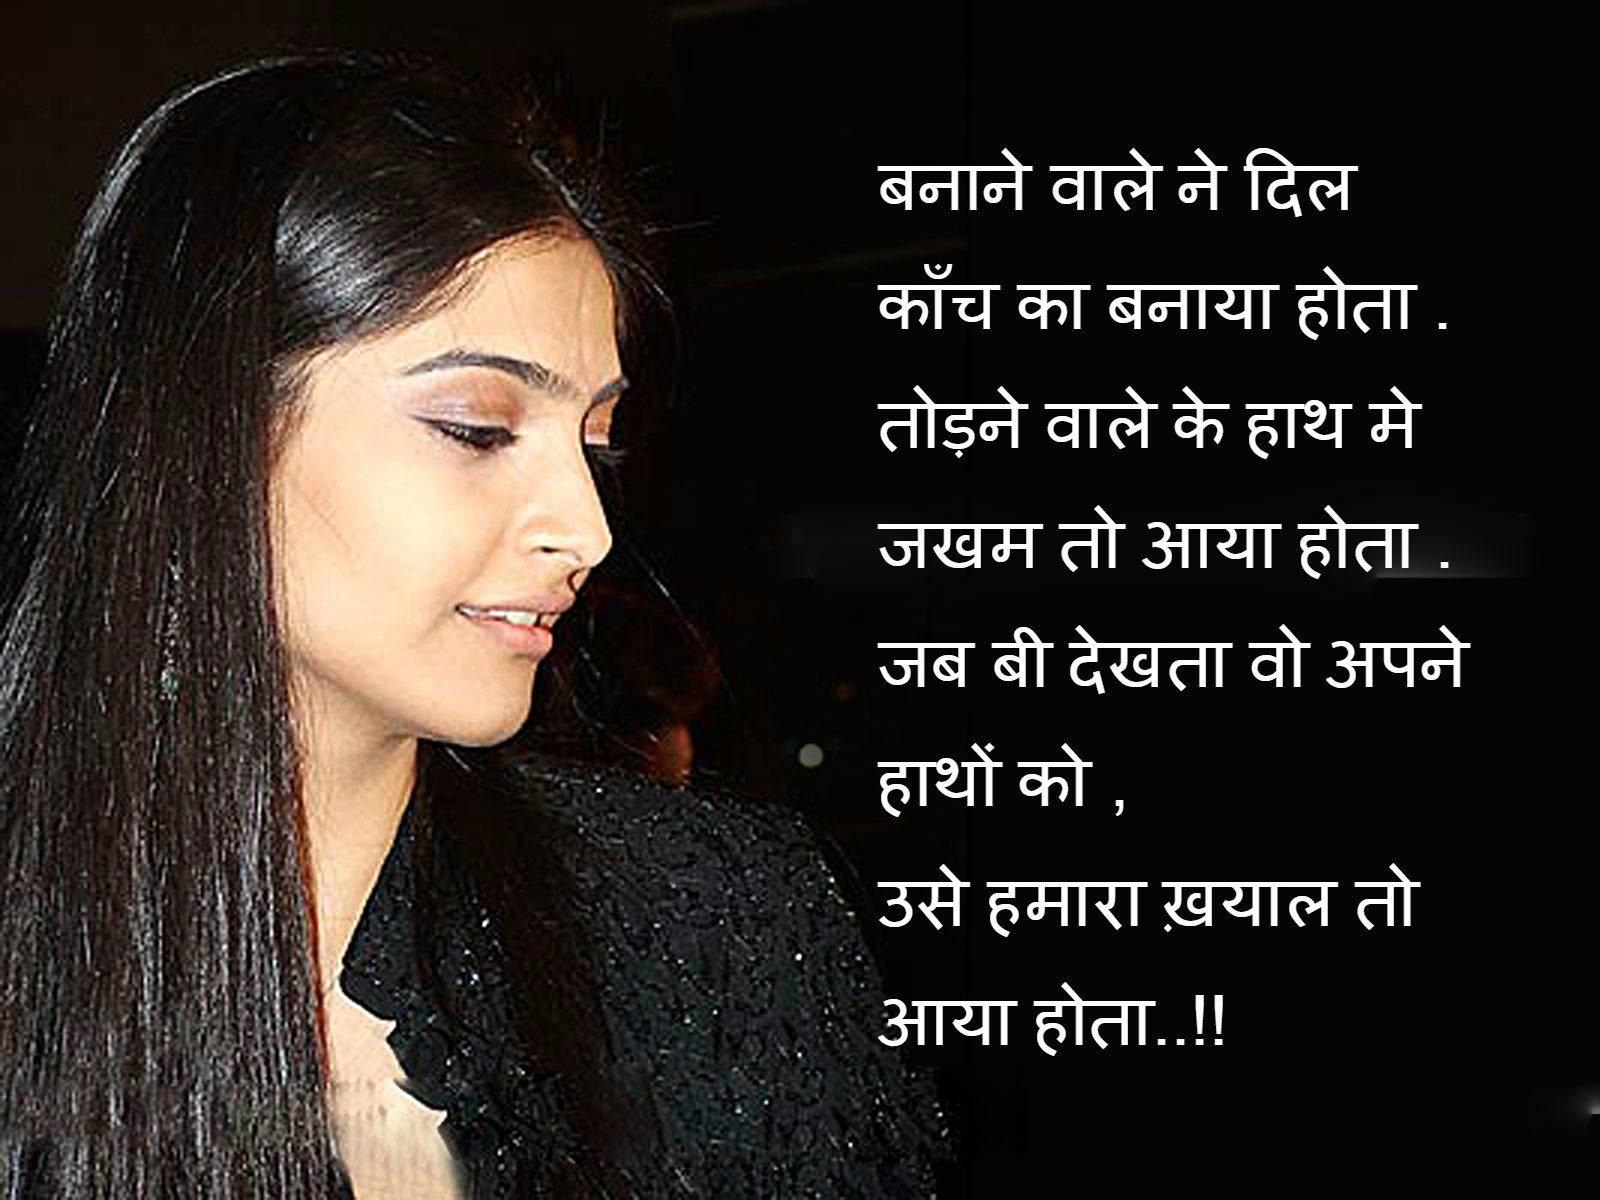 Shayari urdu imagesurdu shayari with pictureurdu shayari wallpaper best facebook latest romantic love shayari sms 2016 altavistaventures Choice Image